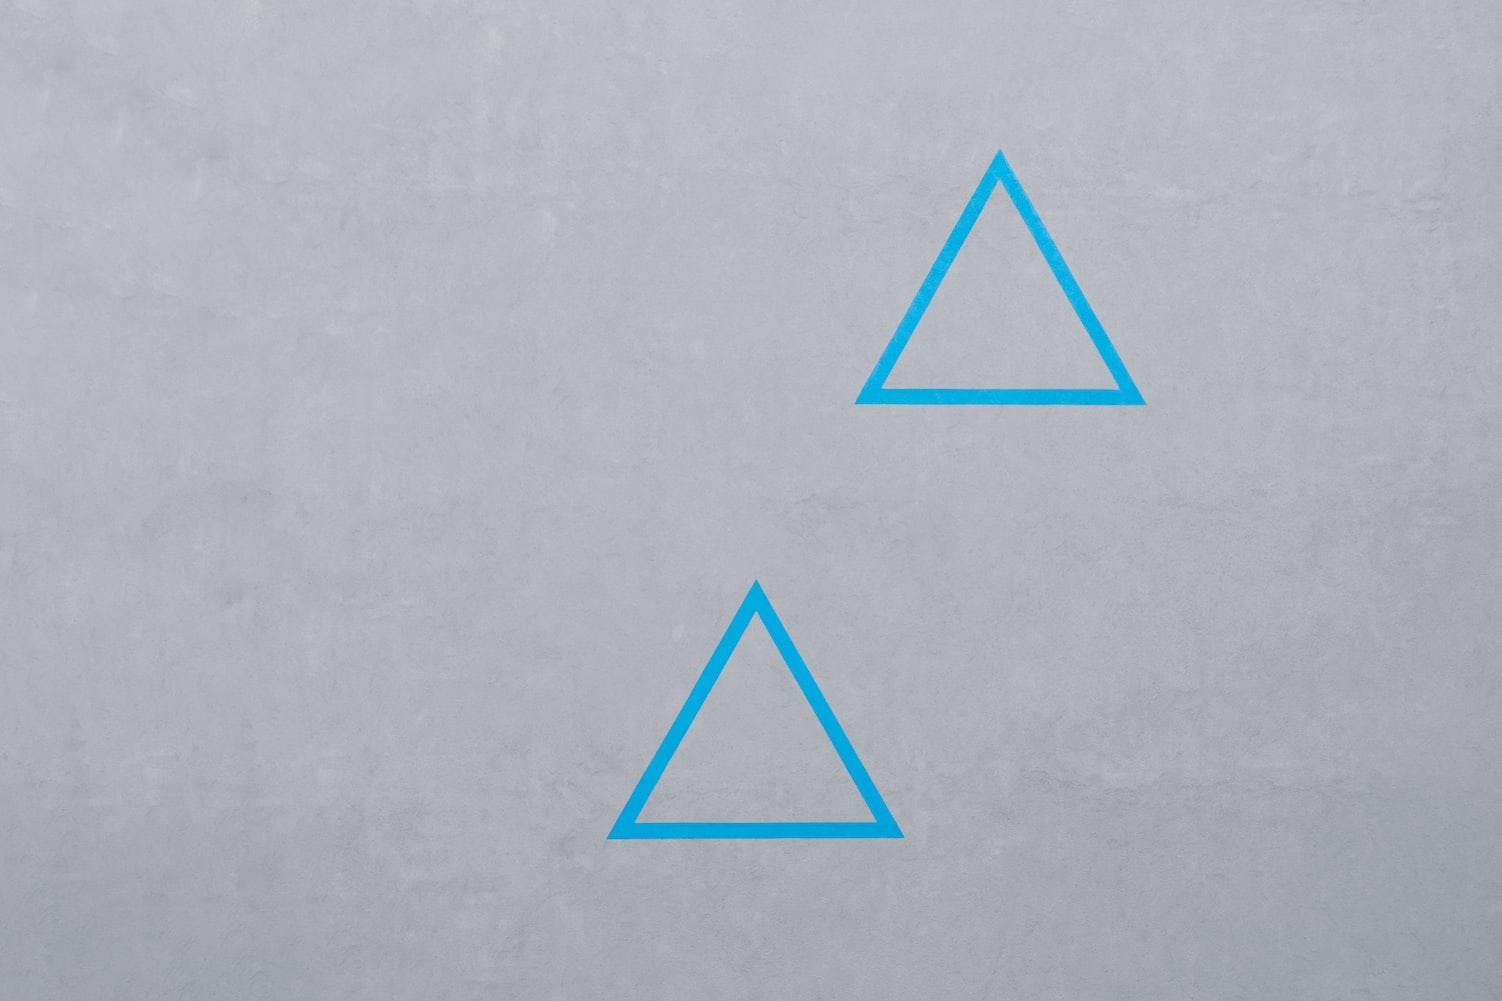 rhetoric triangle